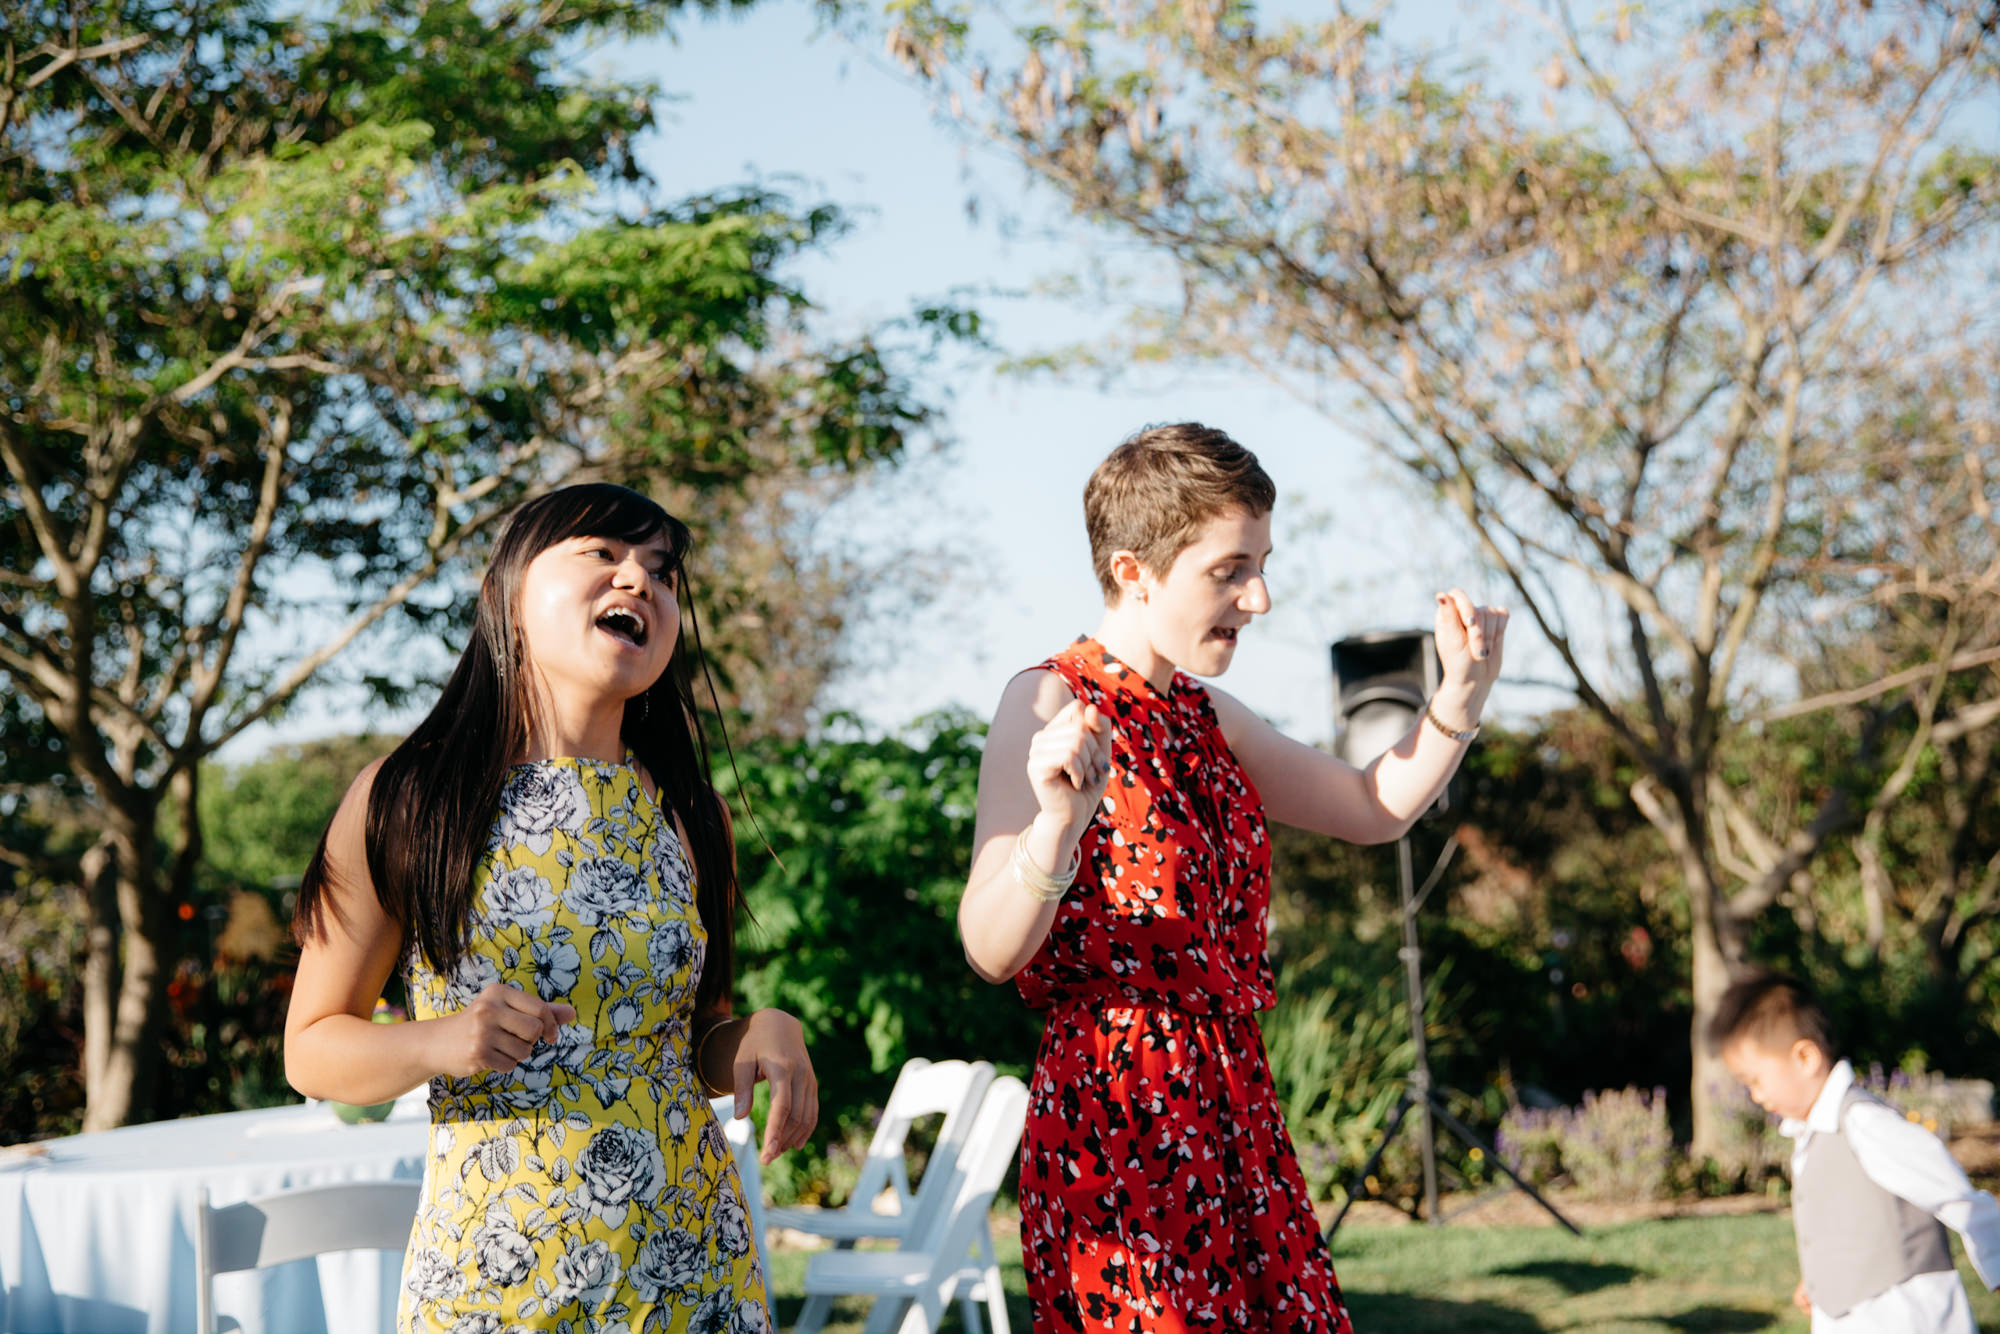 Tian and Cherry by Jenna Pangan-113.jpg